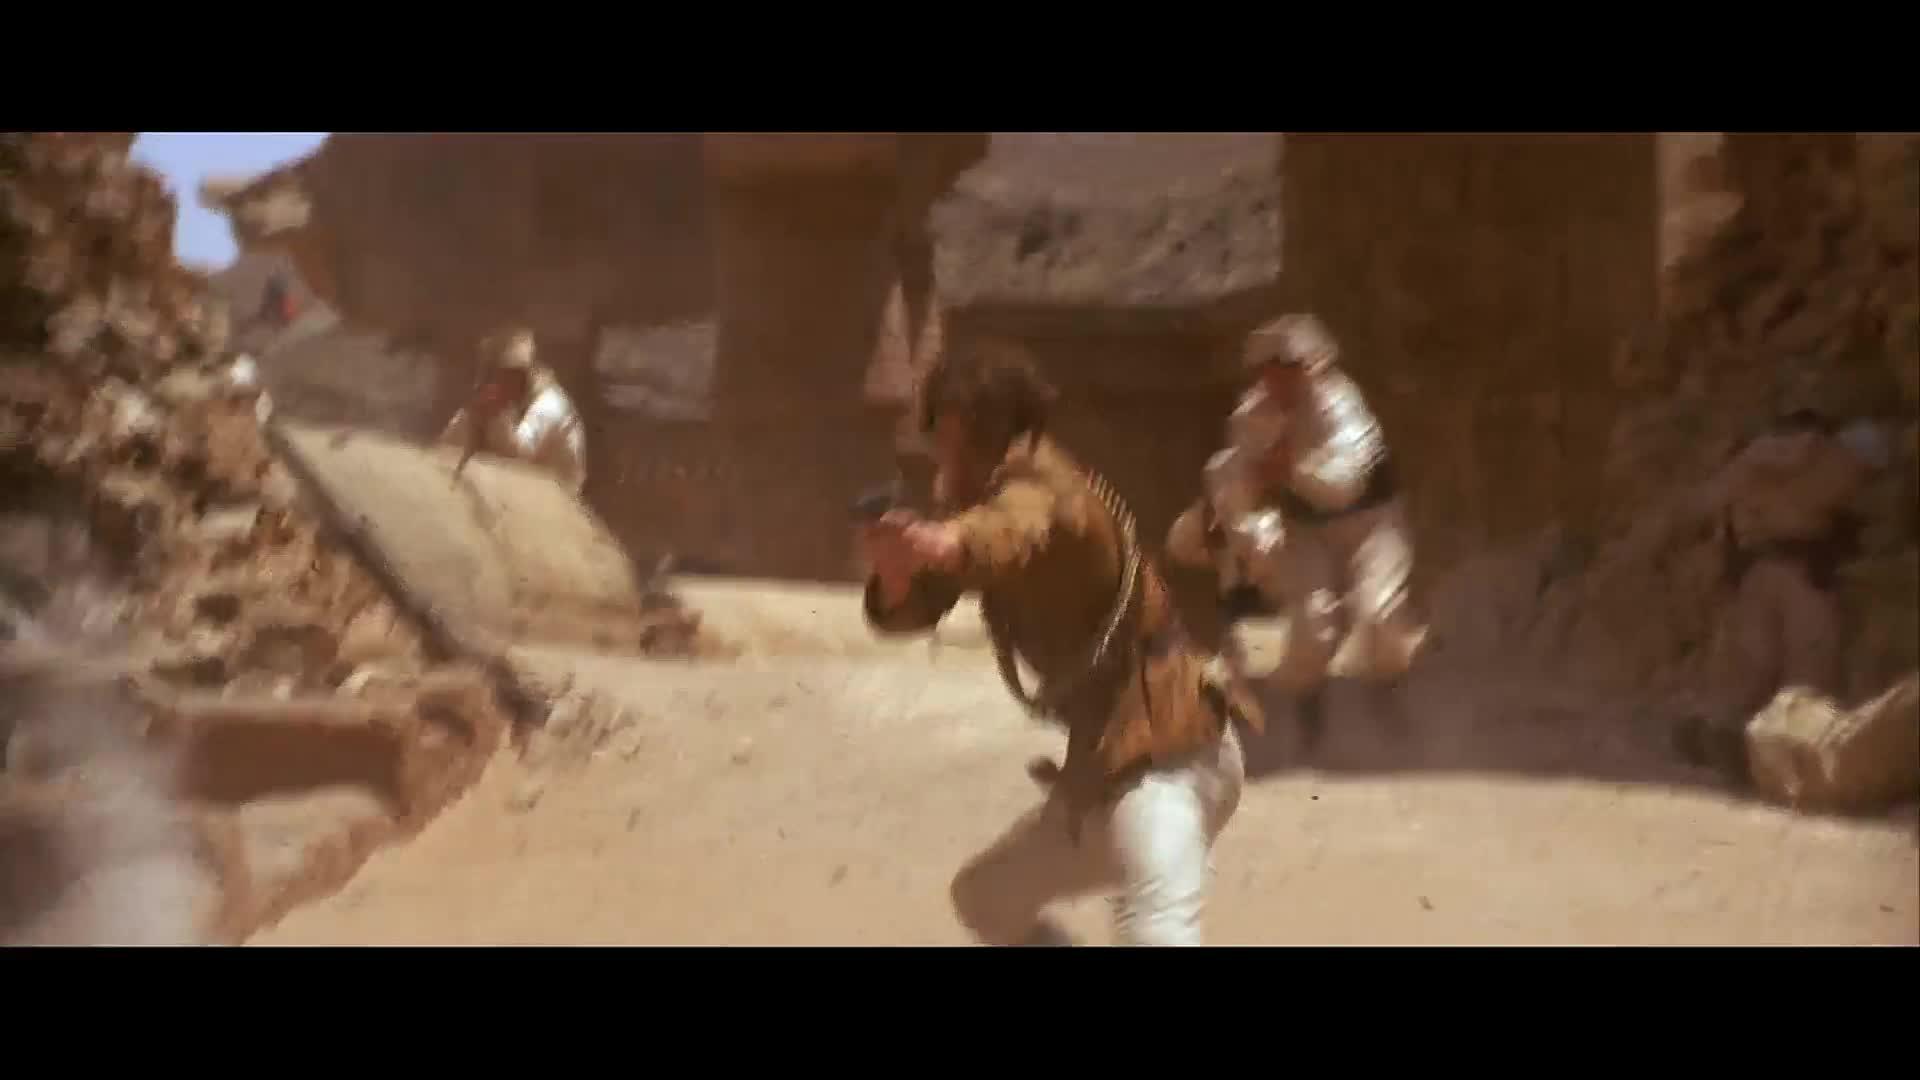 The Mummy 1 คืนชีพคำสาปนรกล้างโลก (1999)